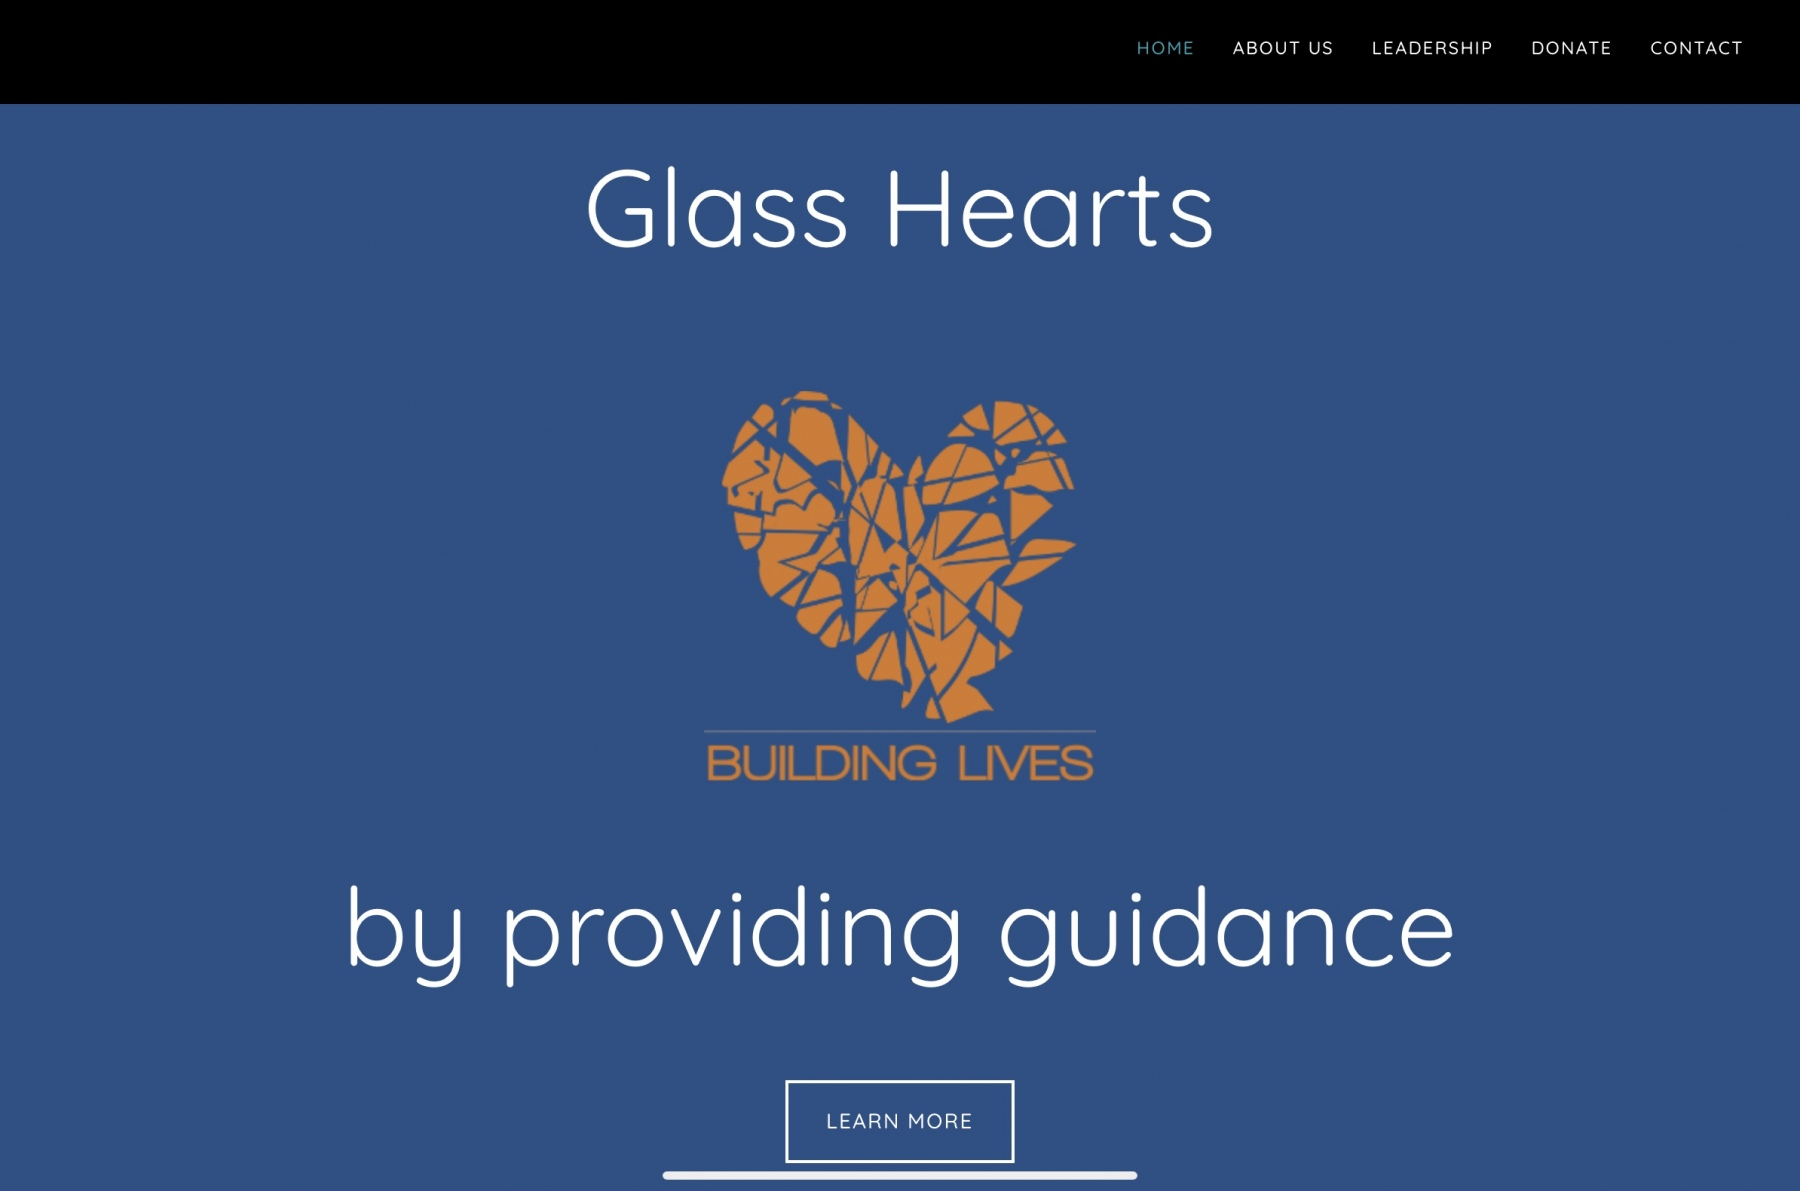 glasshearts.org